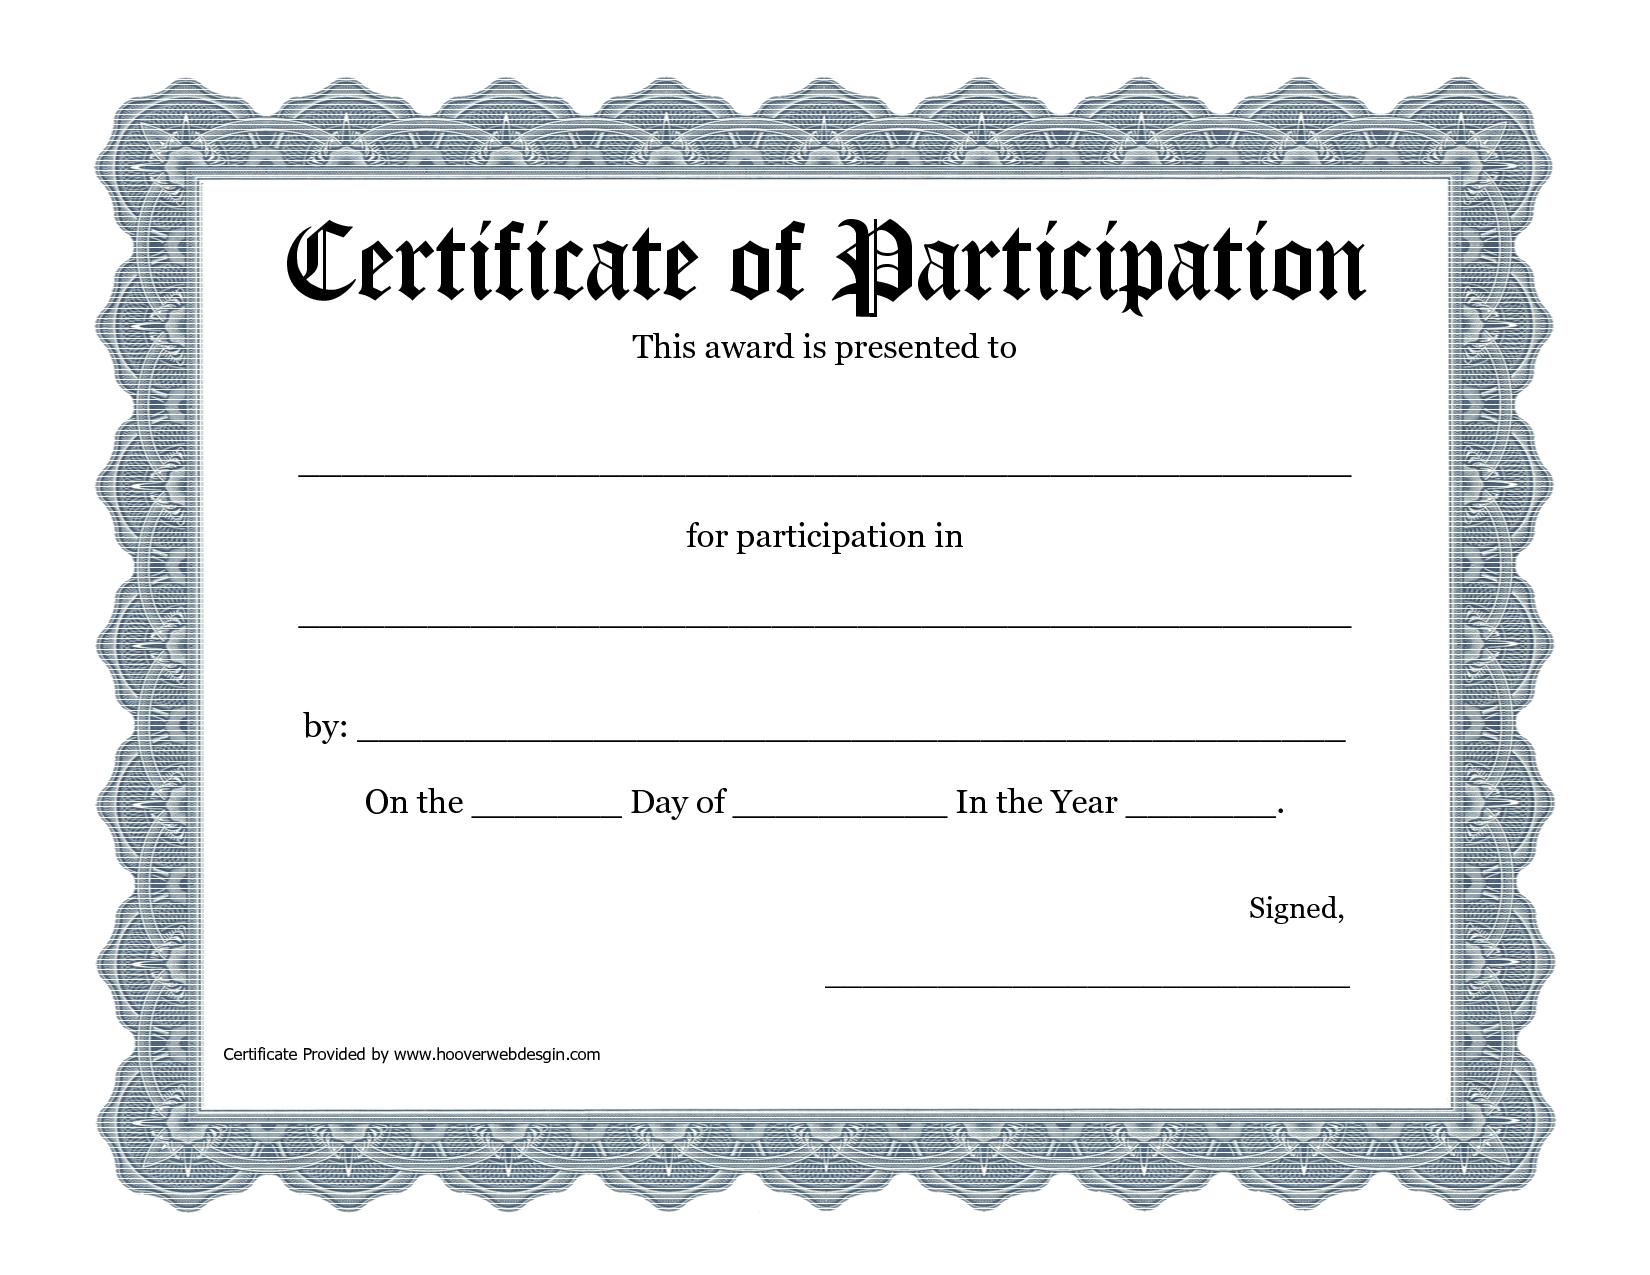 Free Printable Award Certificate Template  Bing Images   Art With Free Art Certificate Templates